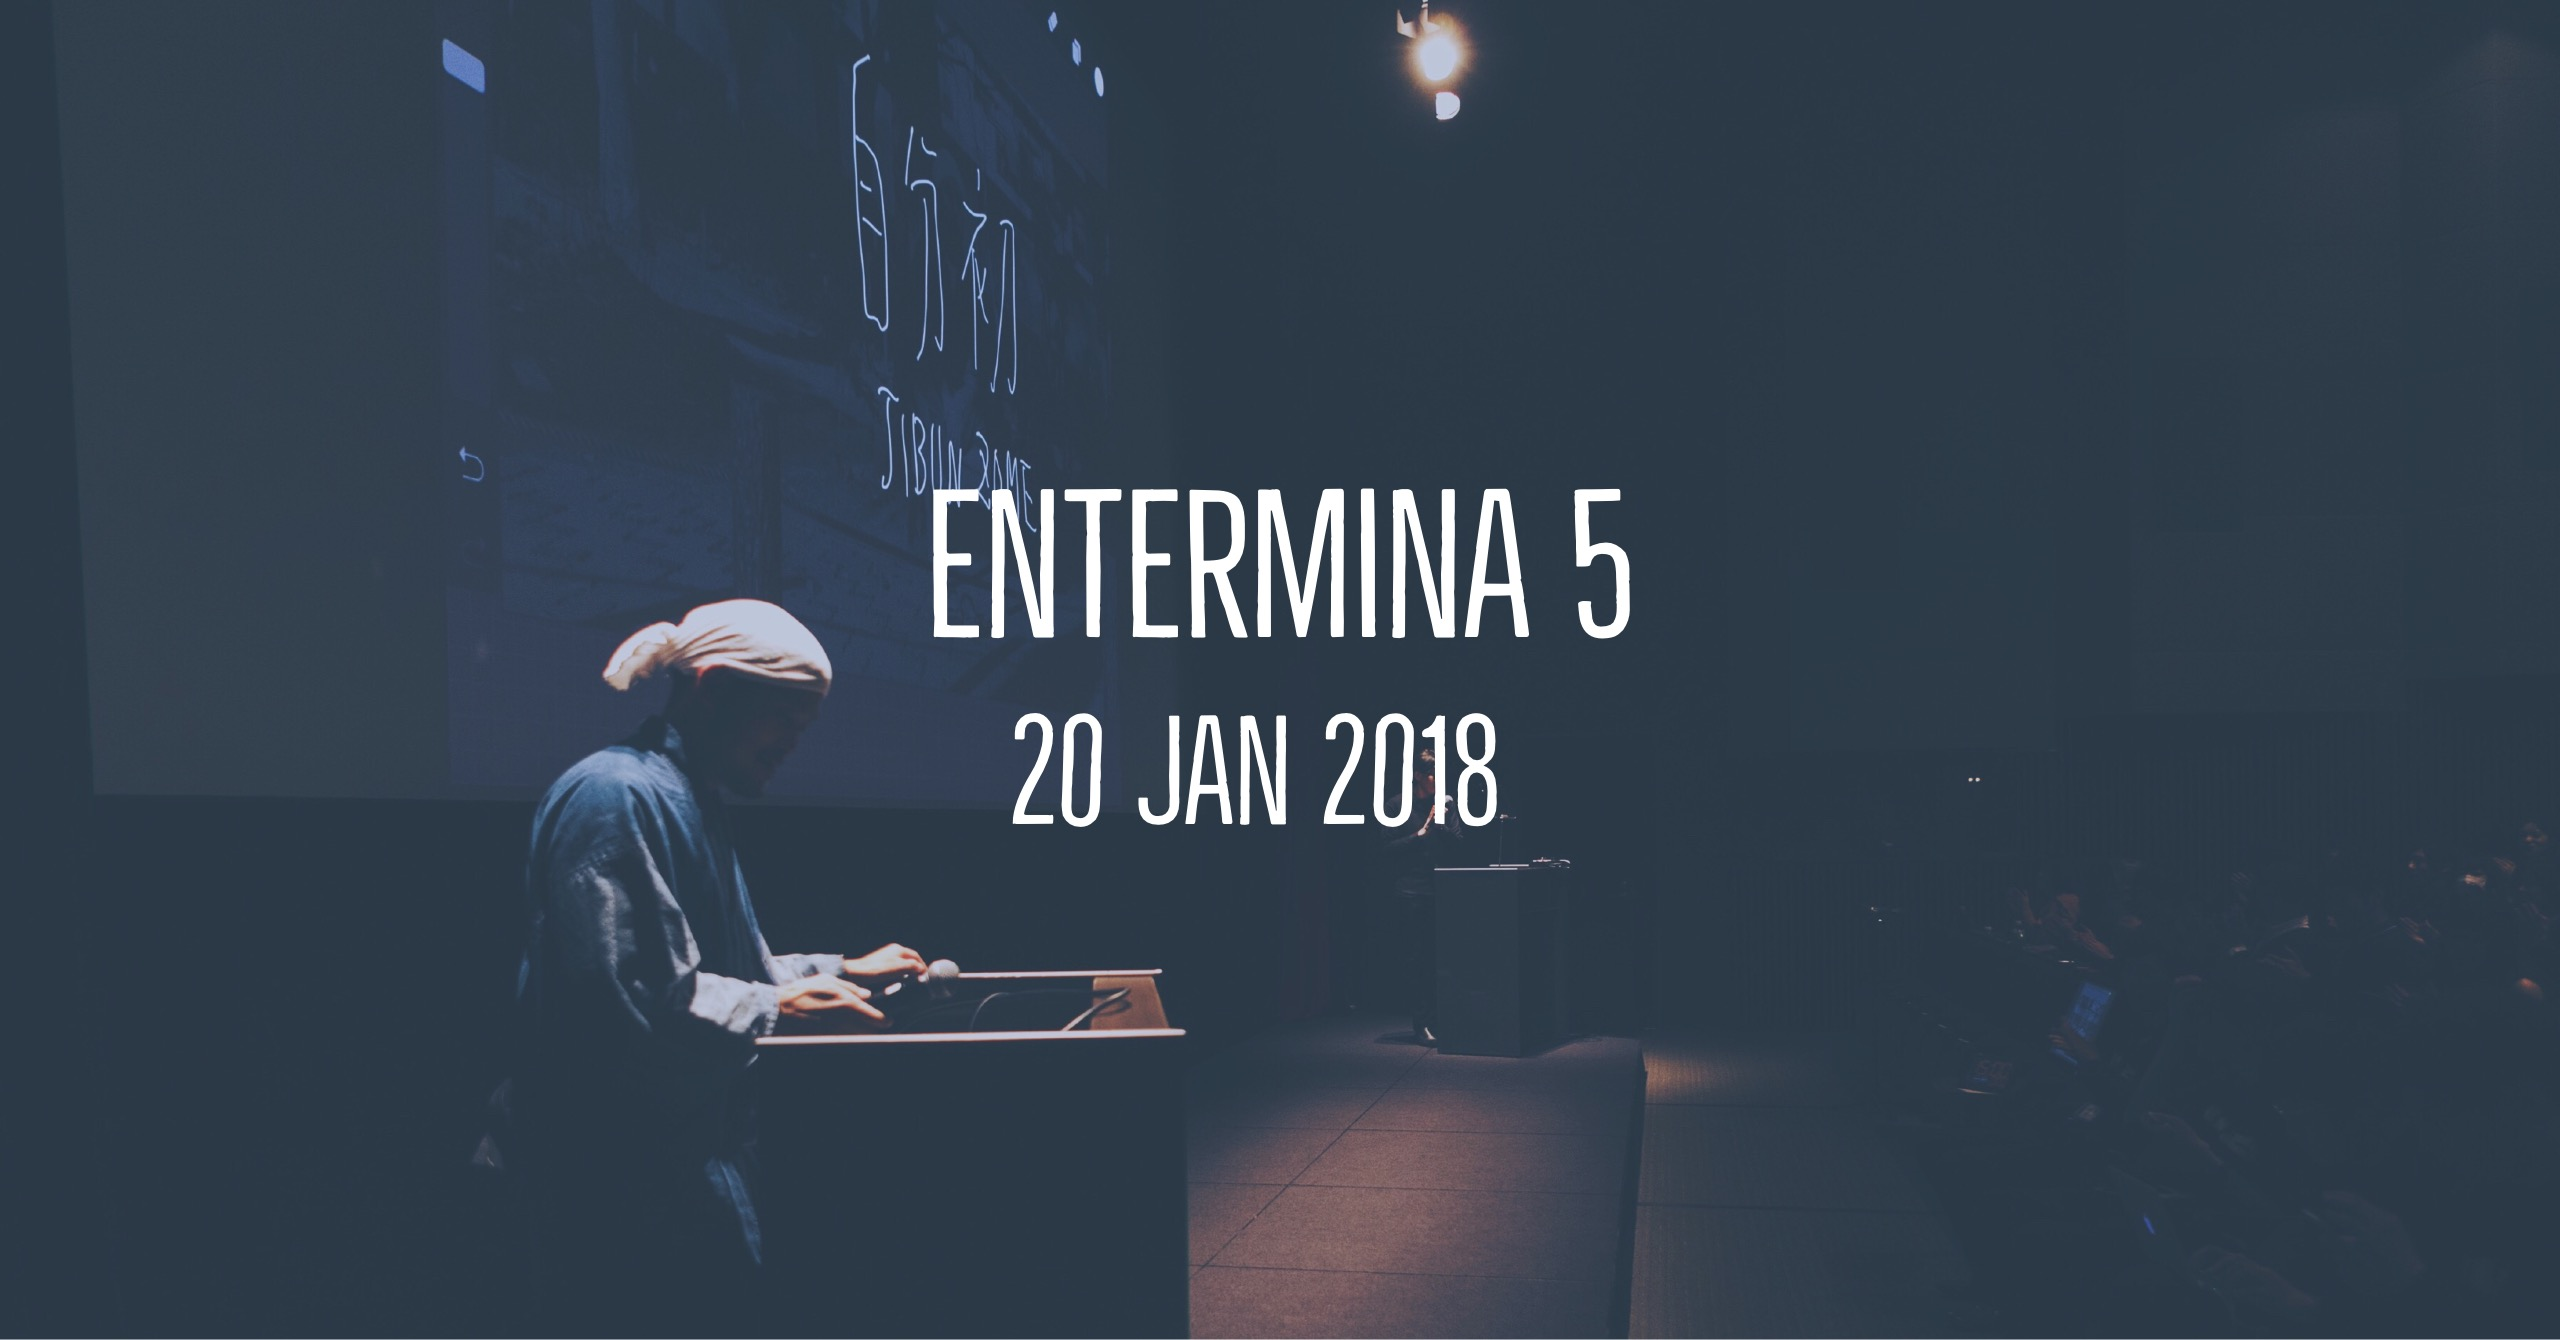 ENTERMINA 5